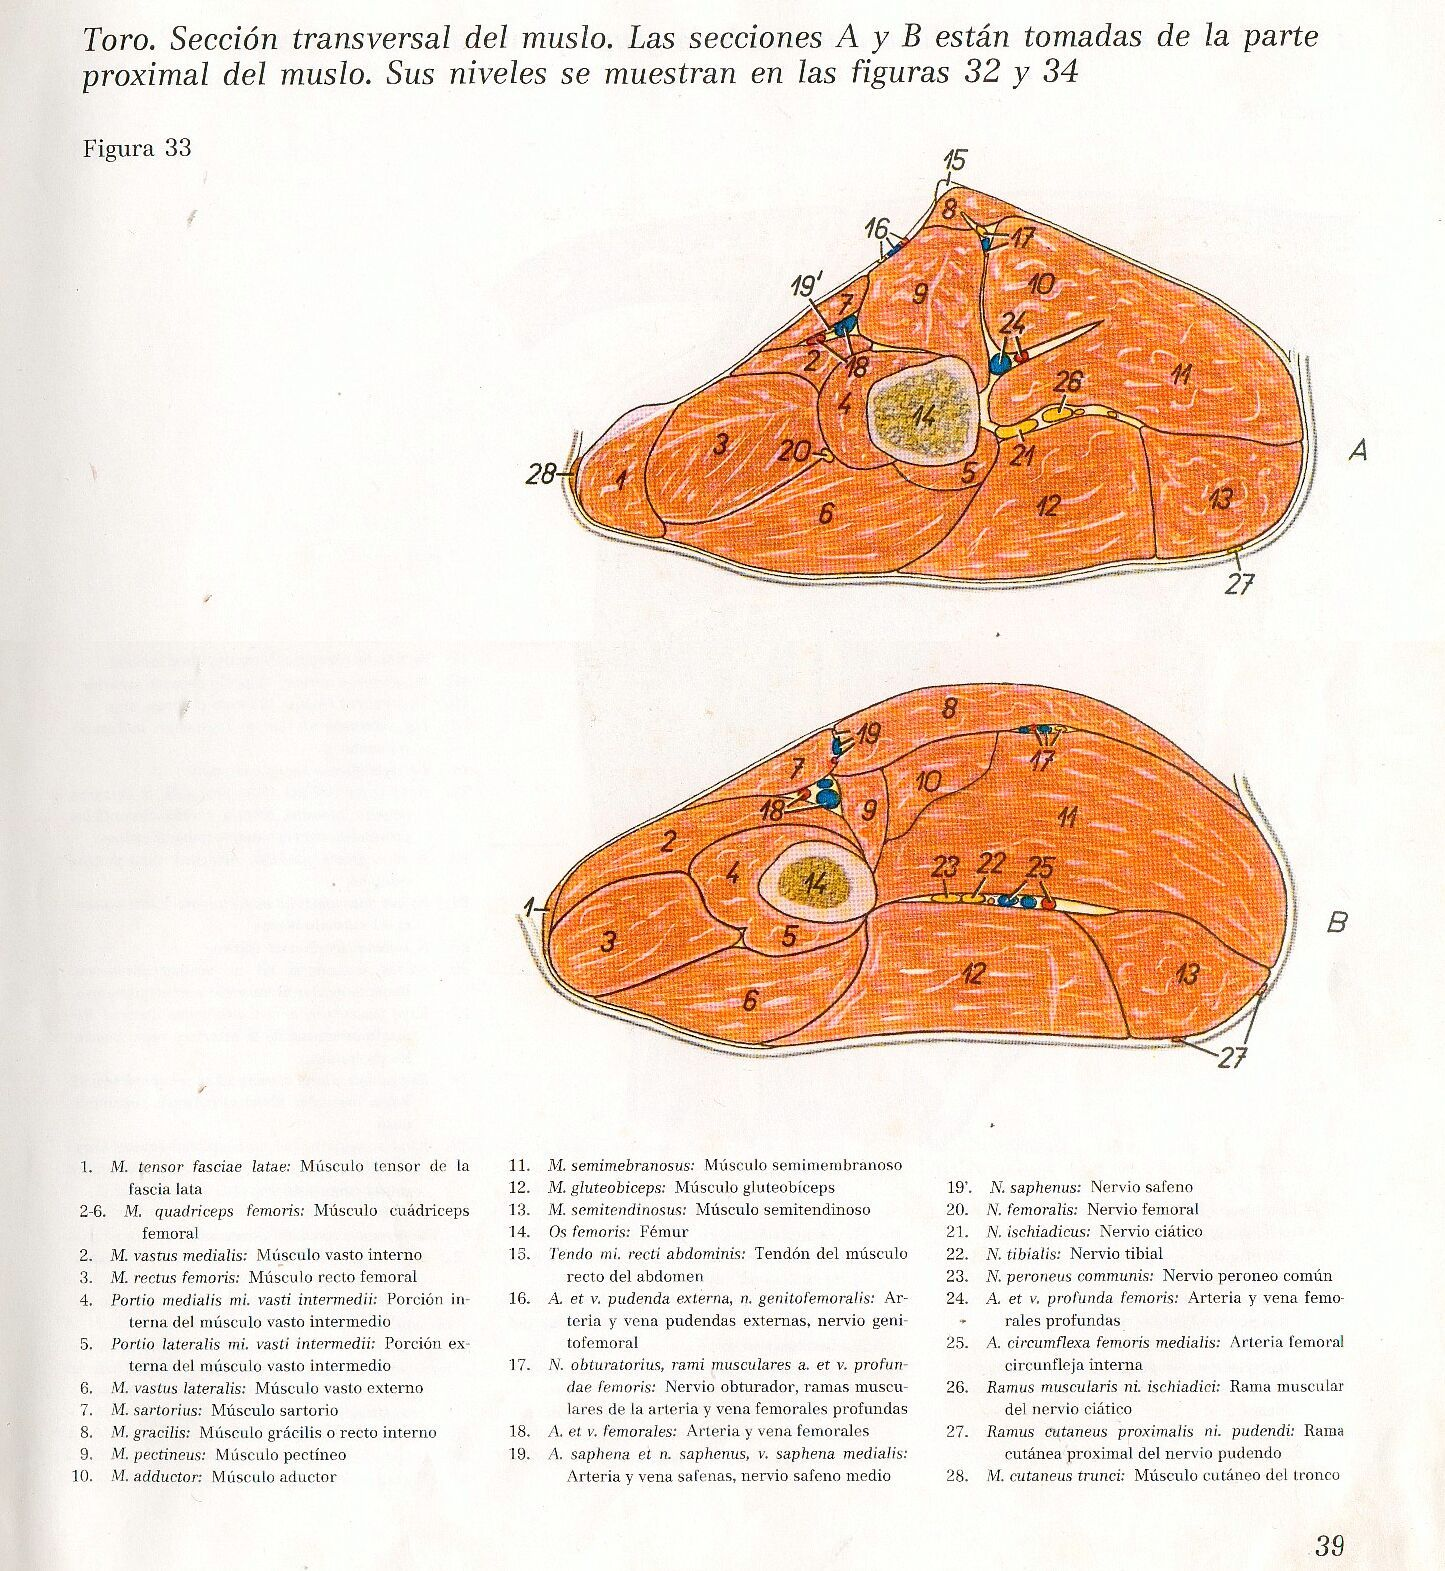 Anatomia Veterinaria: Miembro Pelviano (Toro) | Vet | Pinterest | Animal